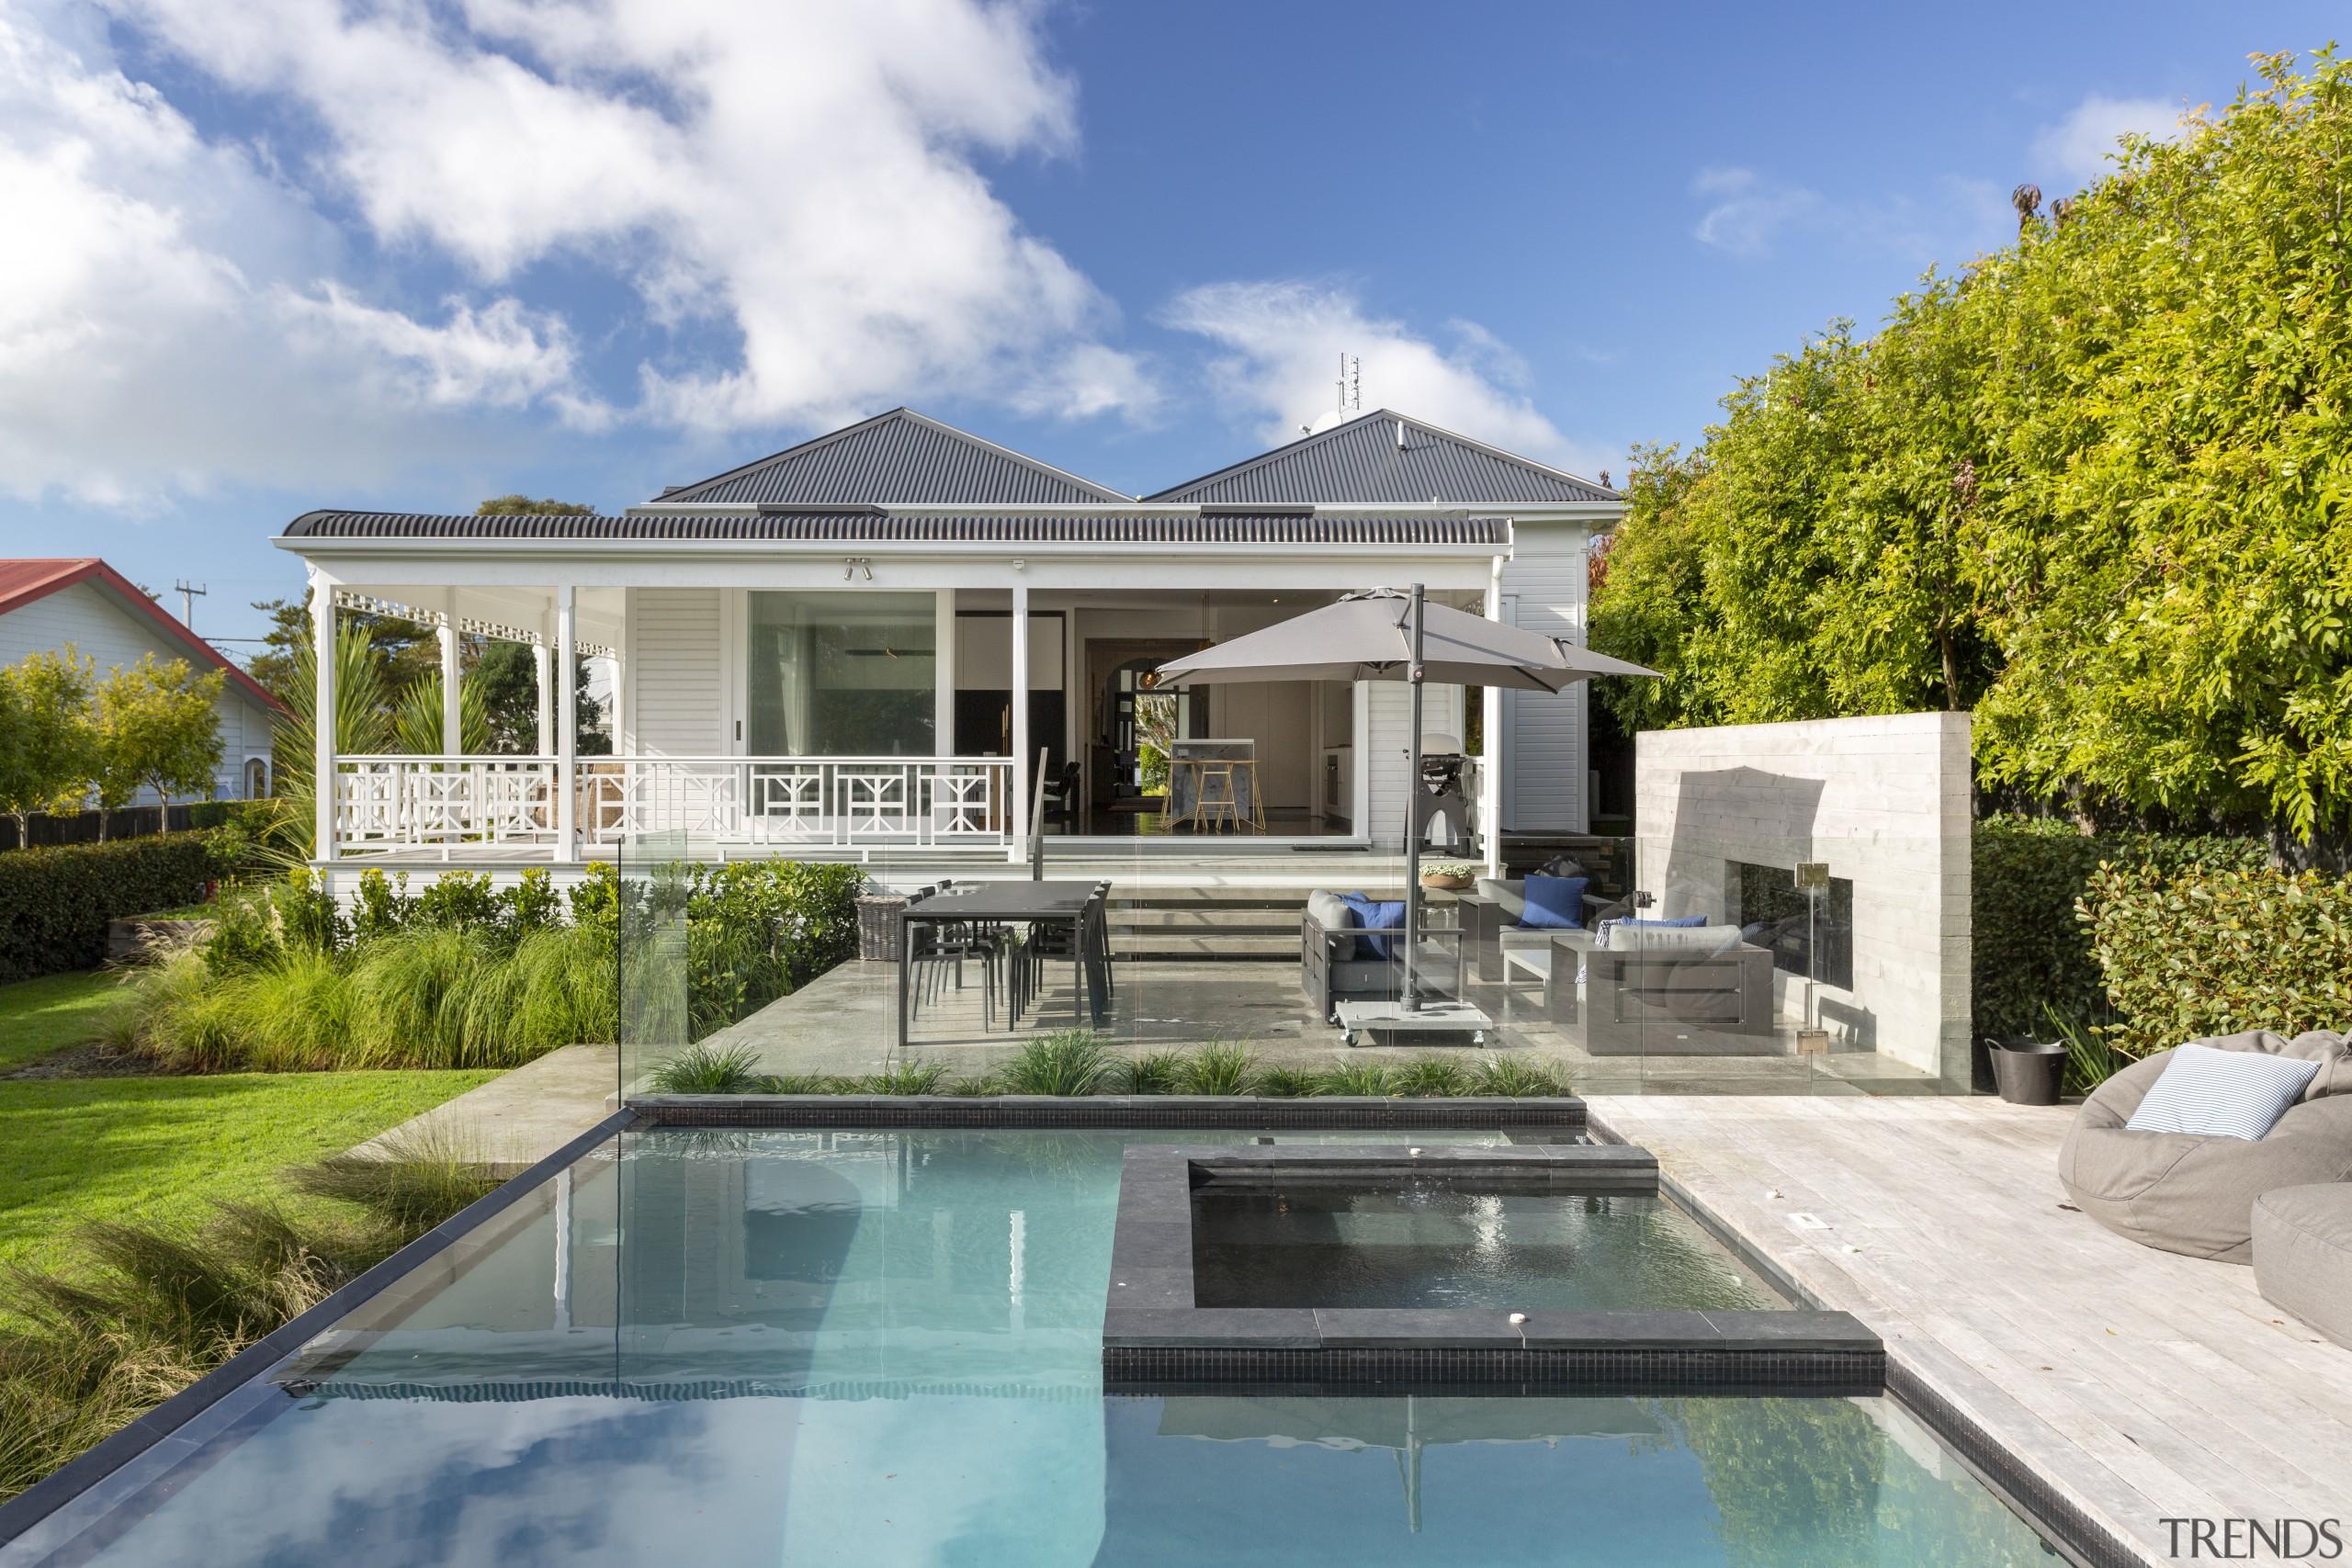 For this modernising renovation by Matt Brew Architect, backyard, estate, home, house, swimming pool, villa, gray, Matt Brew Architect, veranda, spa, play area